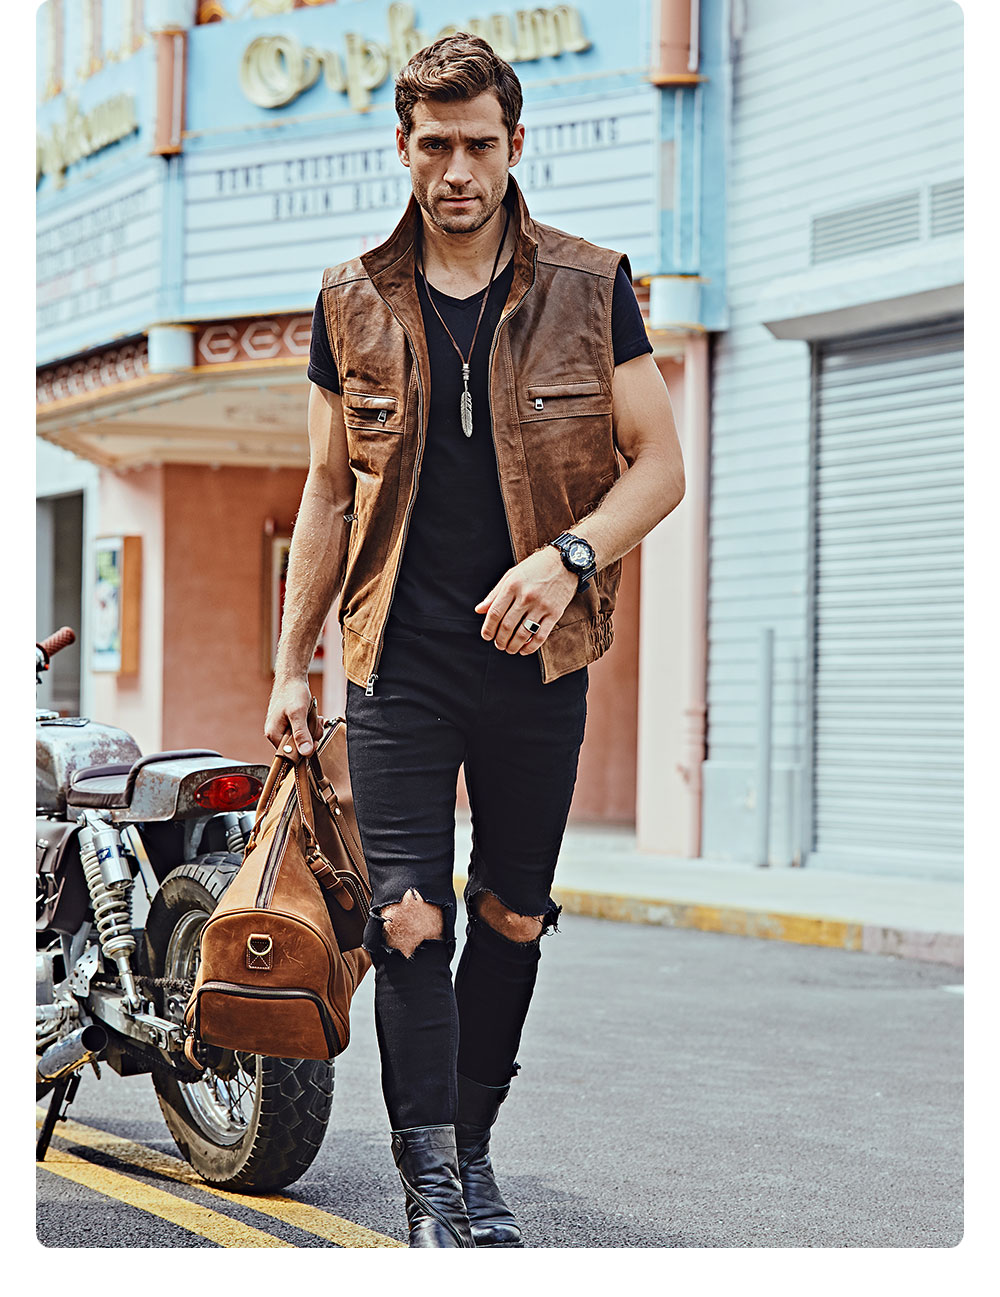 Hf50700f2d0f3476fb8b303626004b0d0w Mew Men's Leather Retro Vest Stand Collar Men's Motorcycle Casual Vest